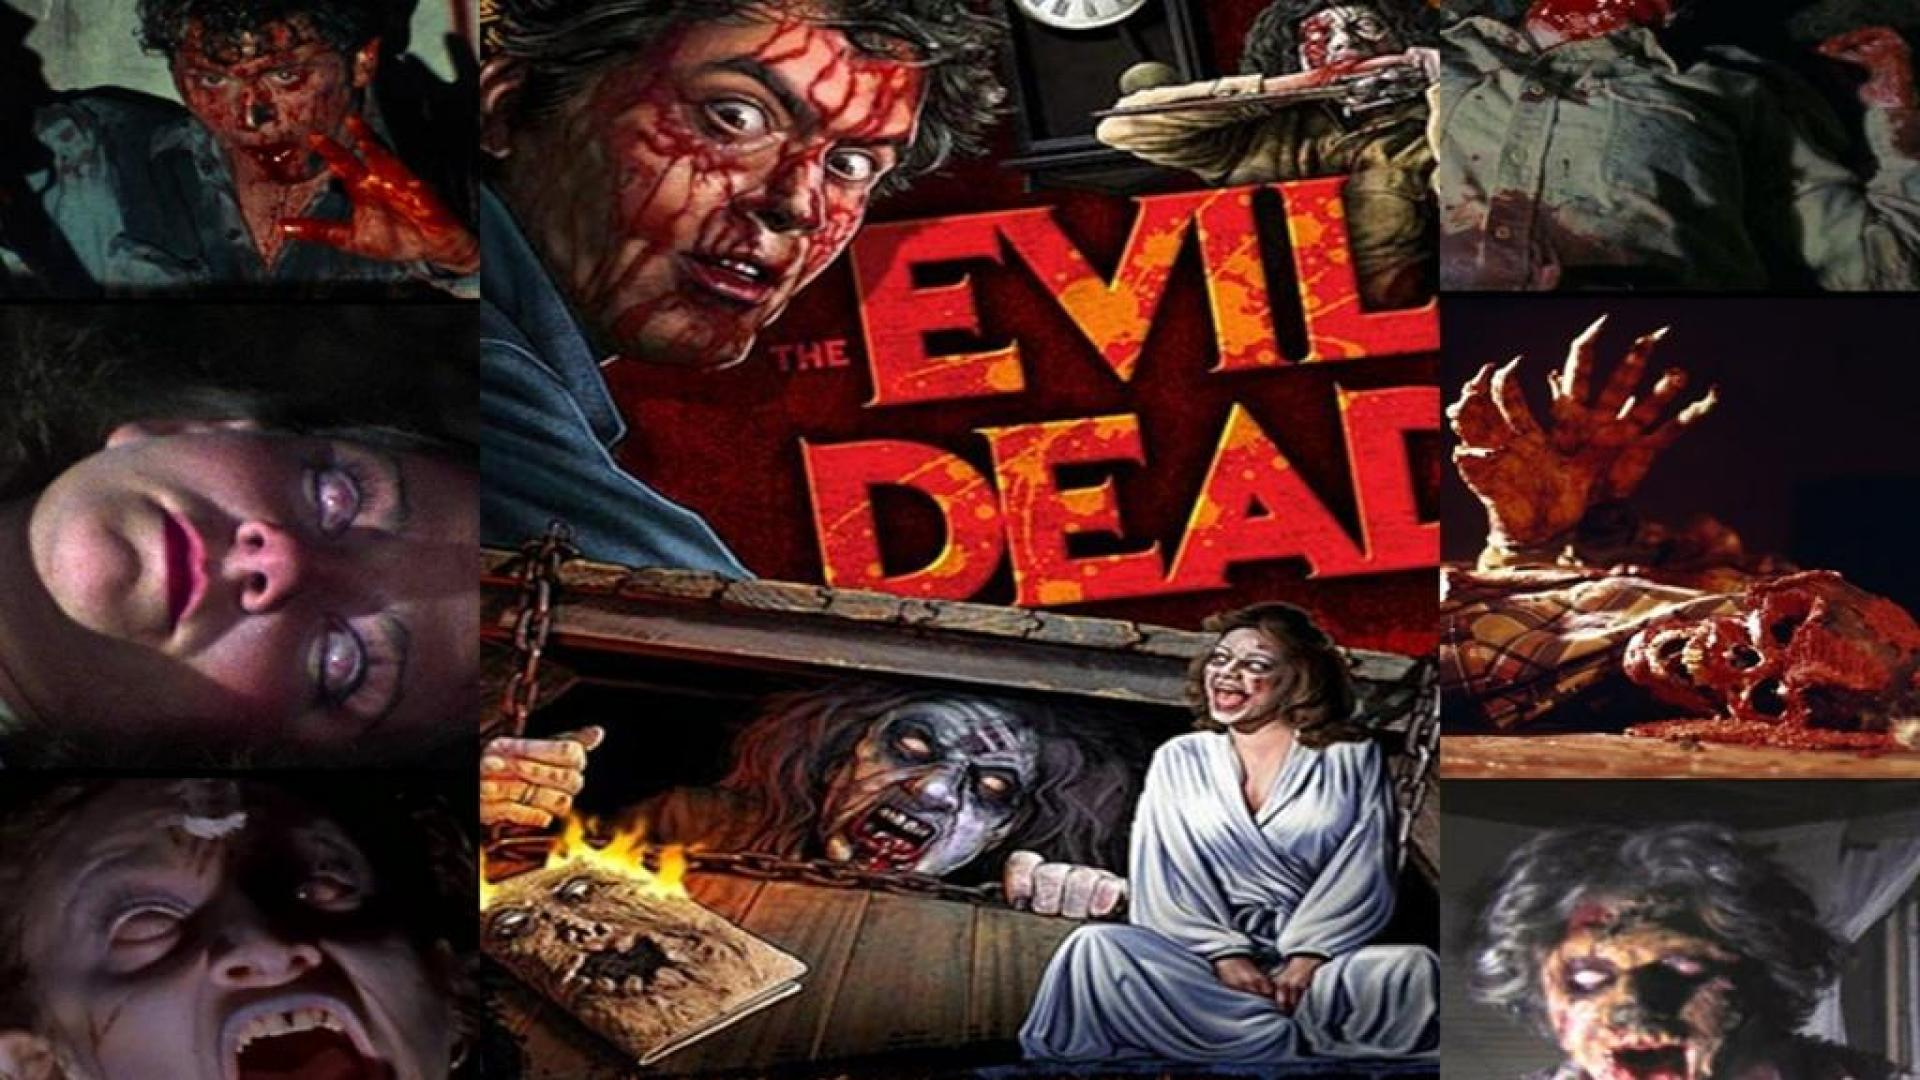 evil dead wallpapers hd wallpapersafari